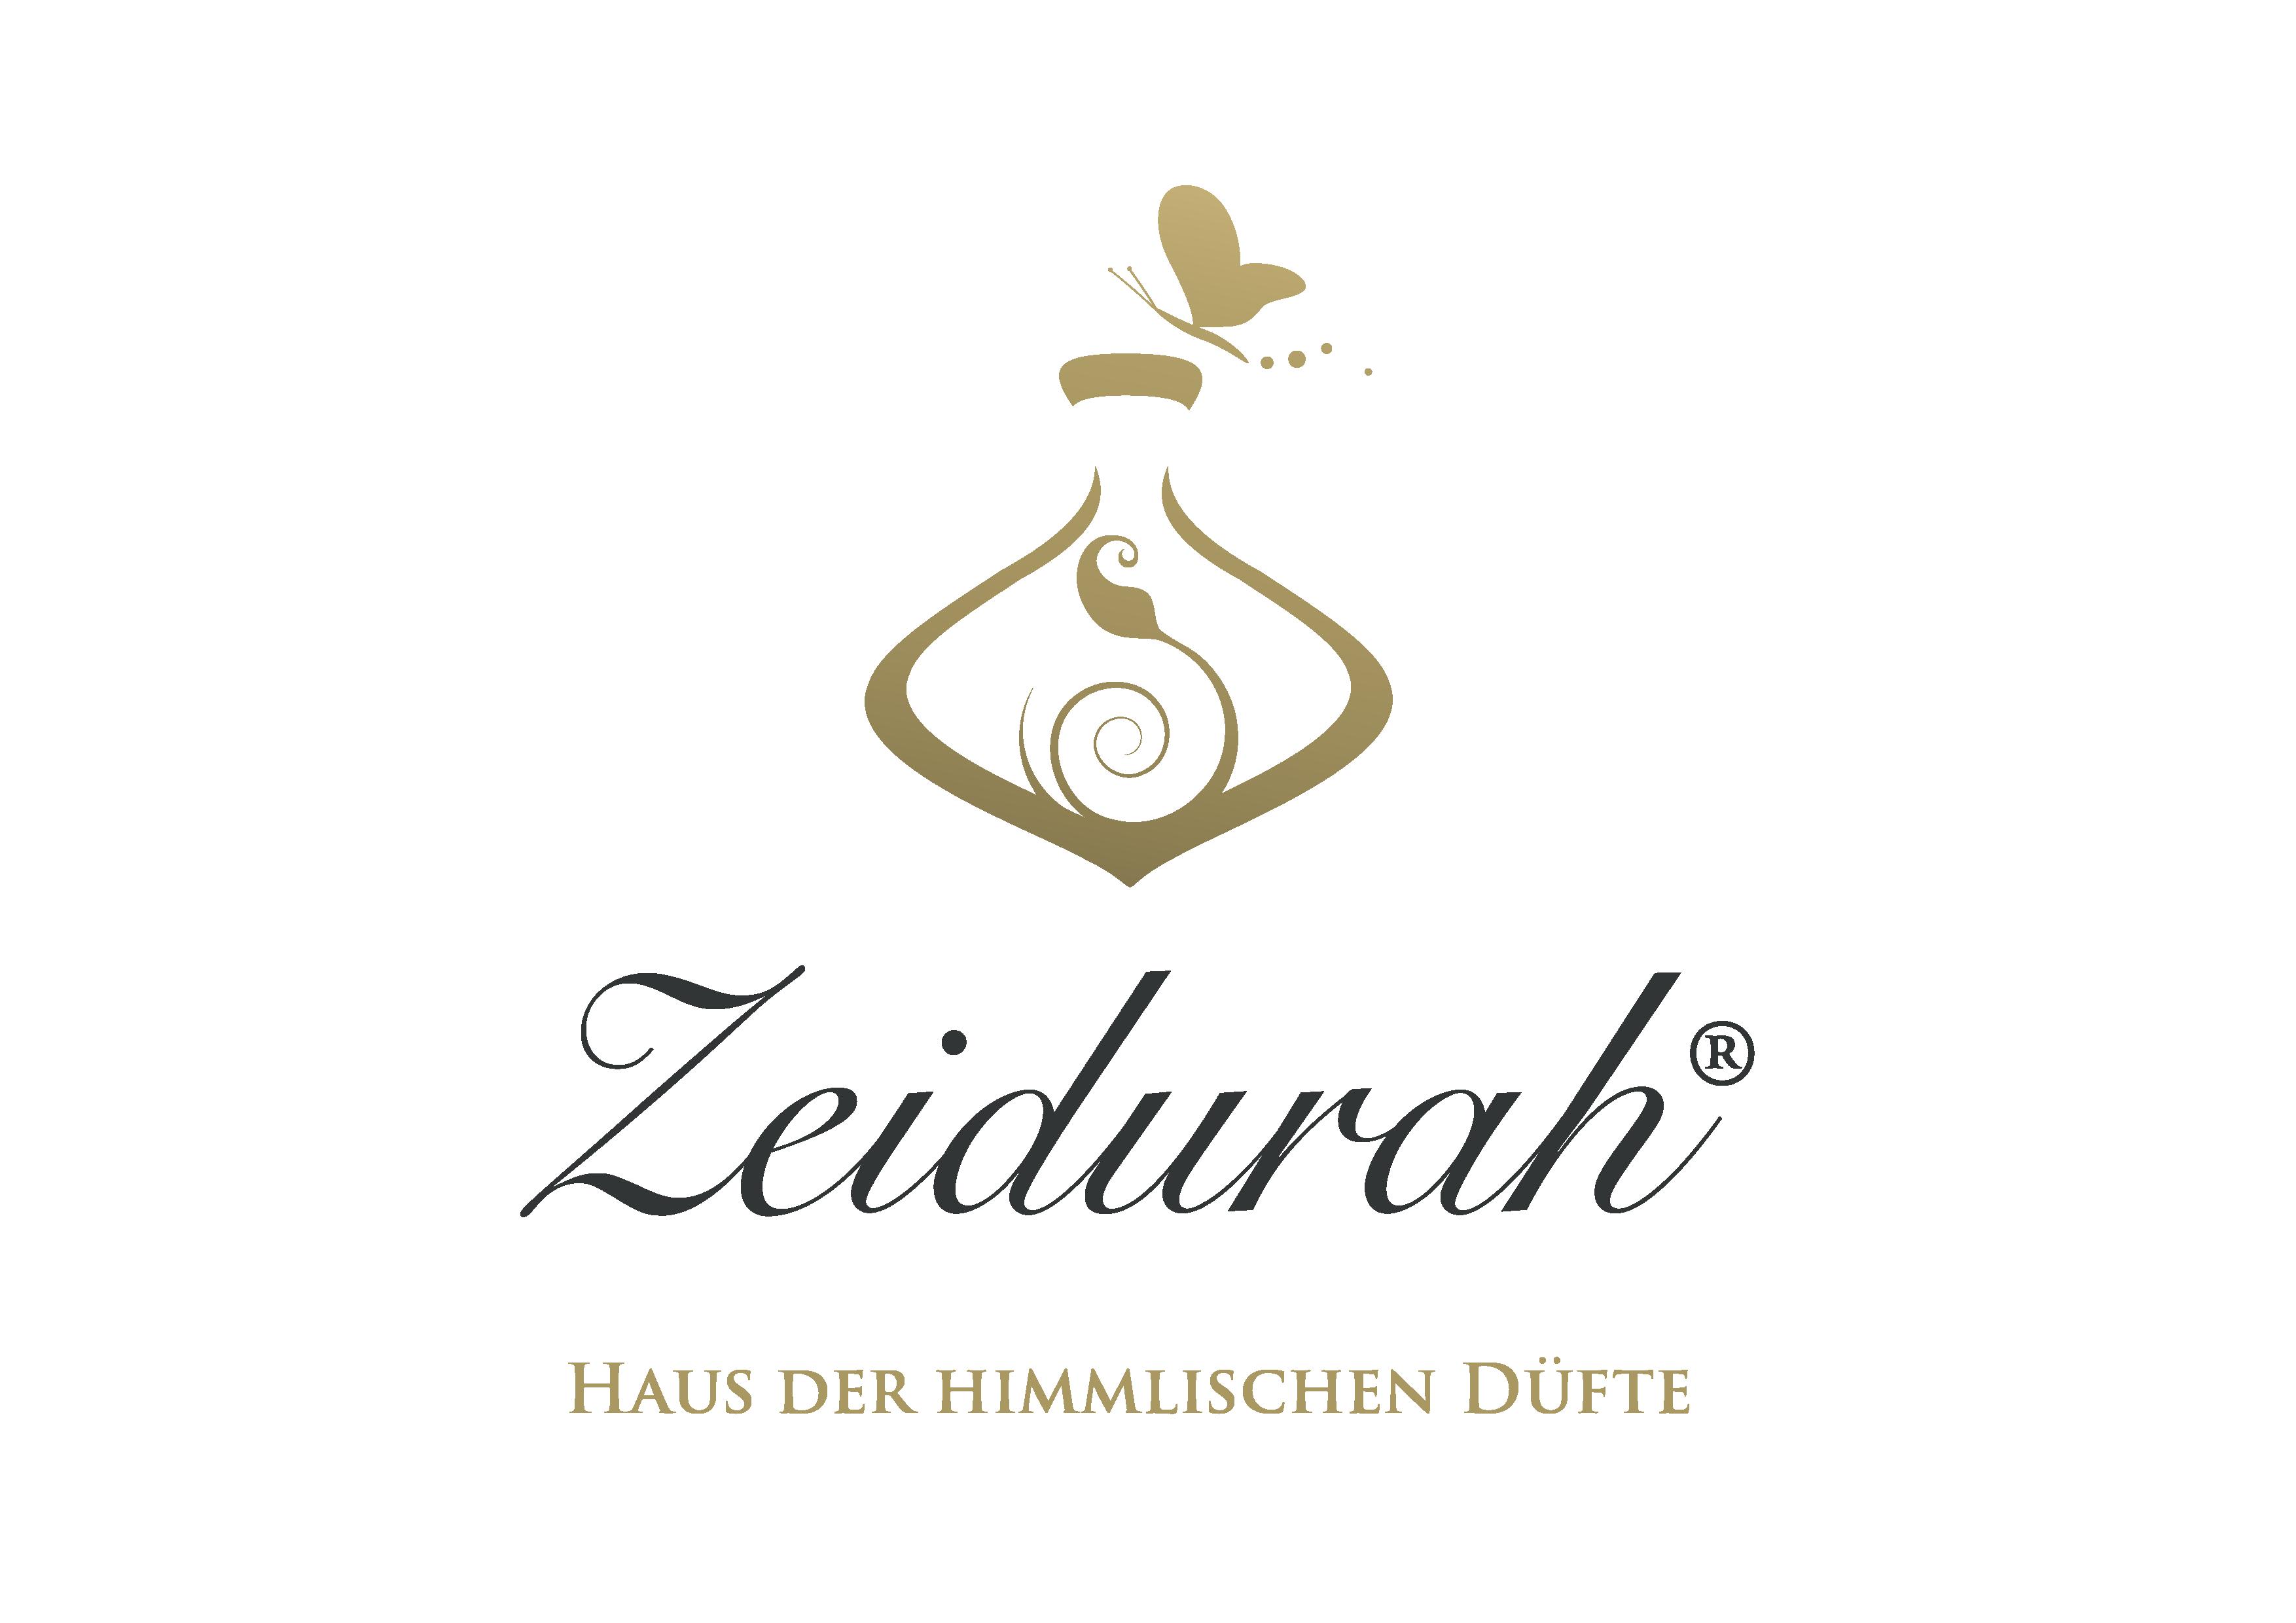 Referenzen Zeidurah Onlineshop eCommerce Agentur cPerformance